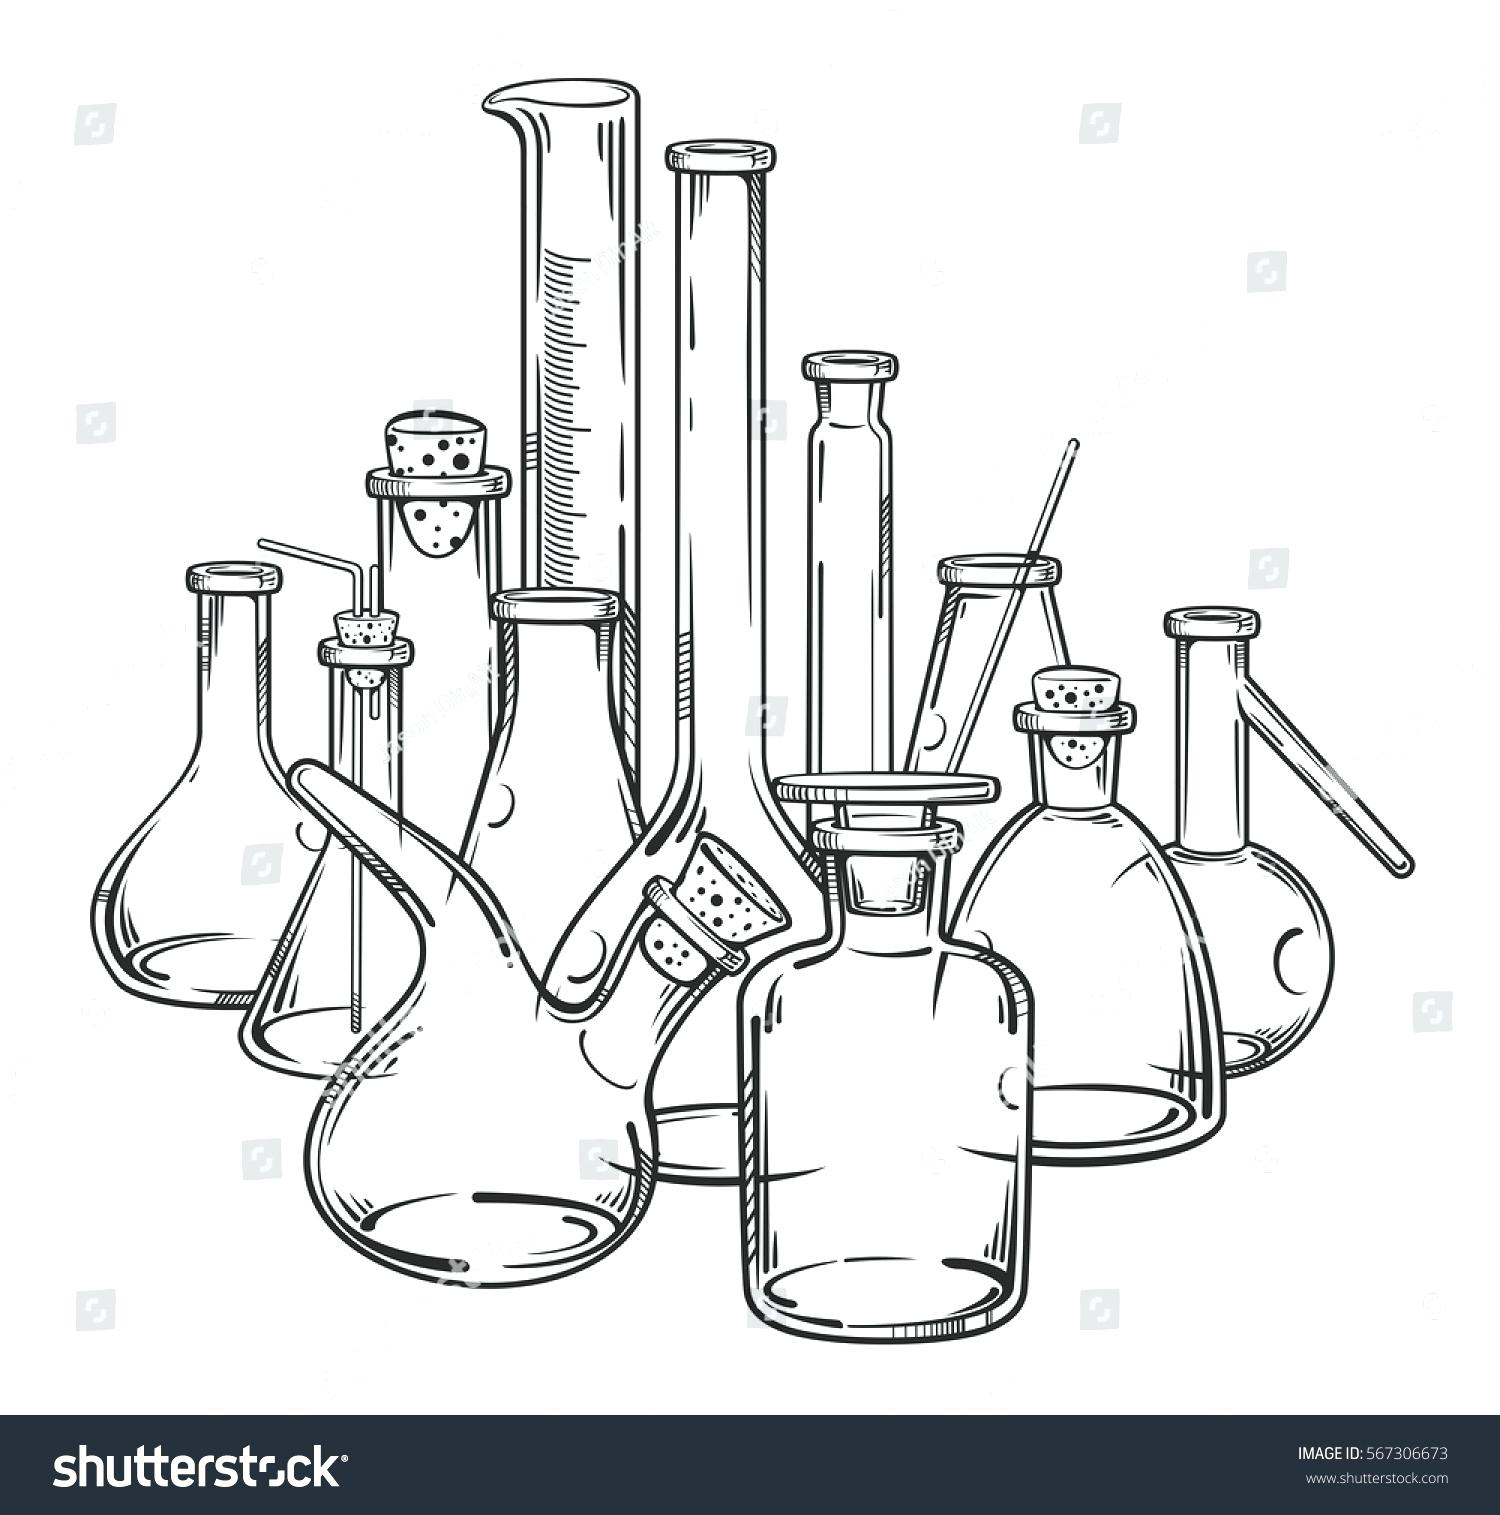 1500x1515 Chemistry Glassware Glassware Chemistry Lab Images Laboratory